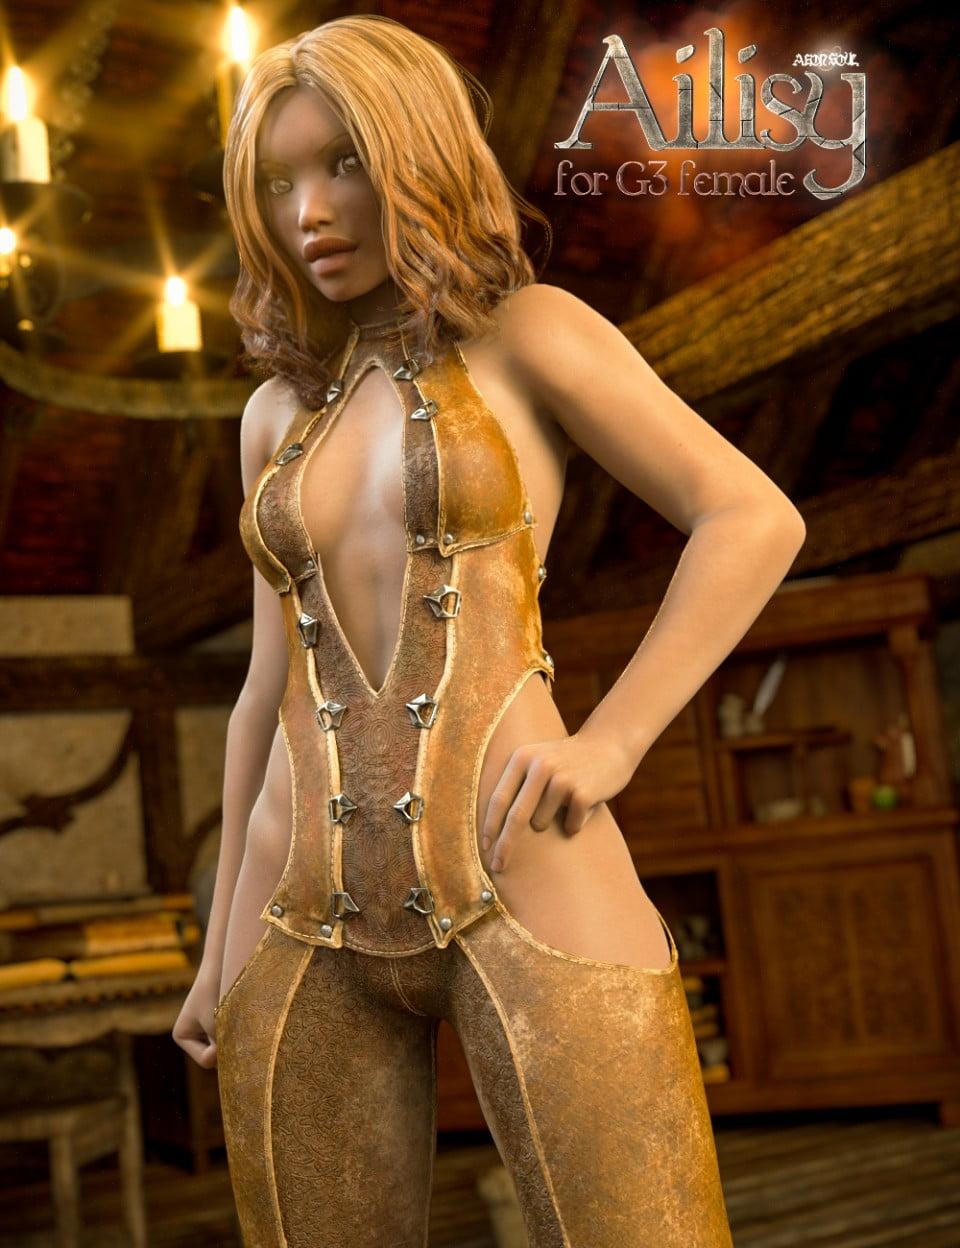 Ailisy for Genesis 3 Female(s)